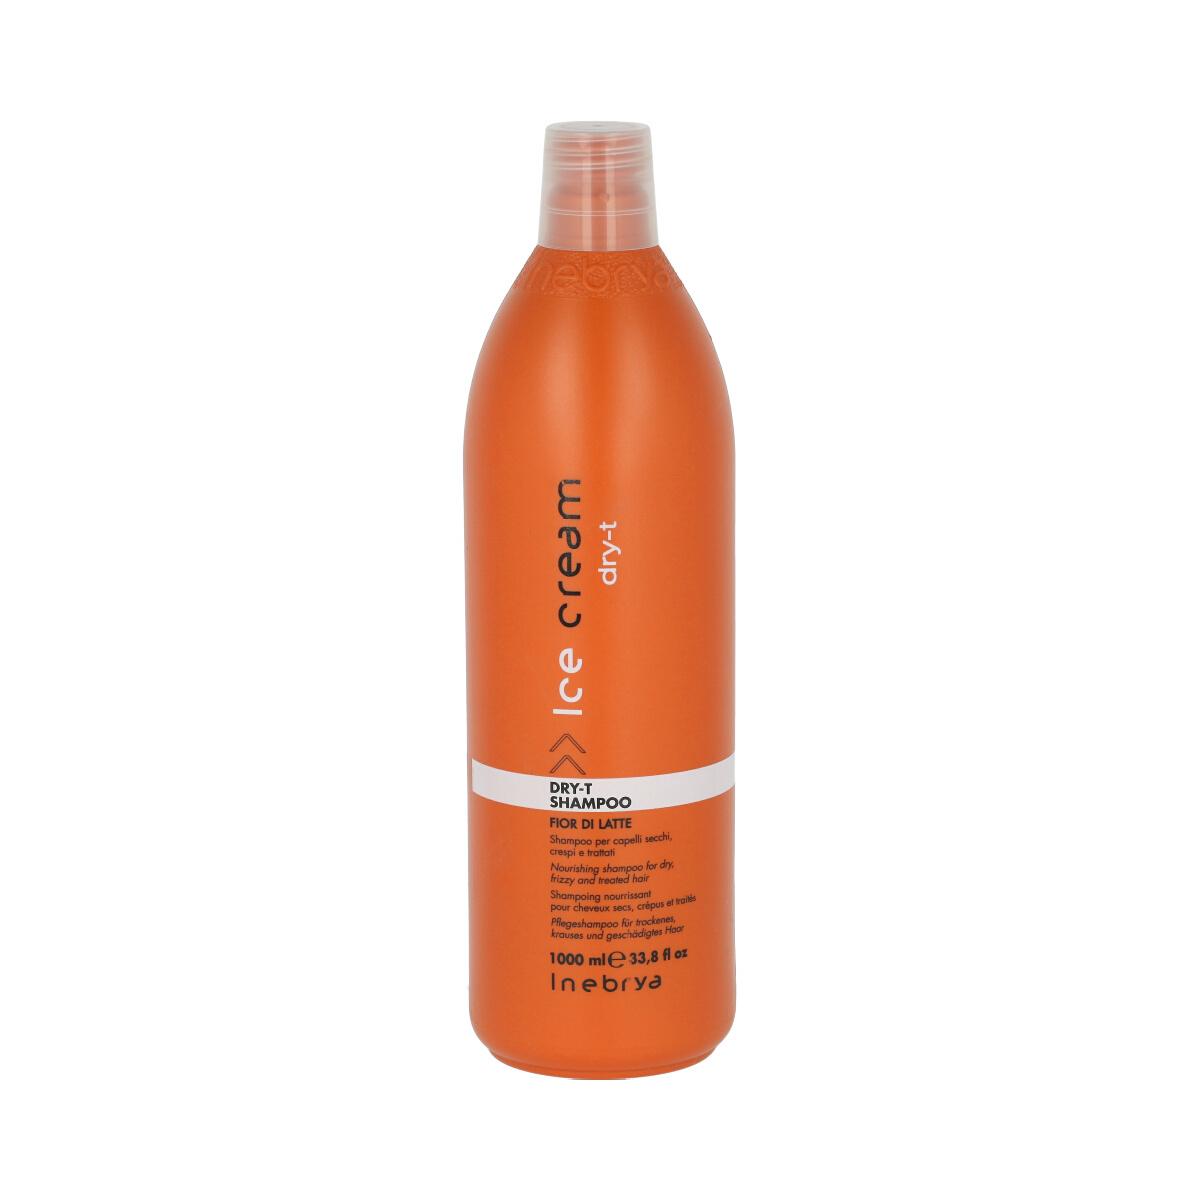 Inebrya Dry-T Shampoo 1000 ml 94138